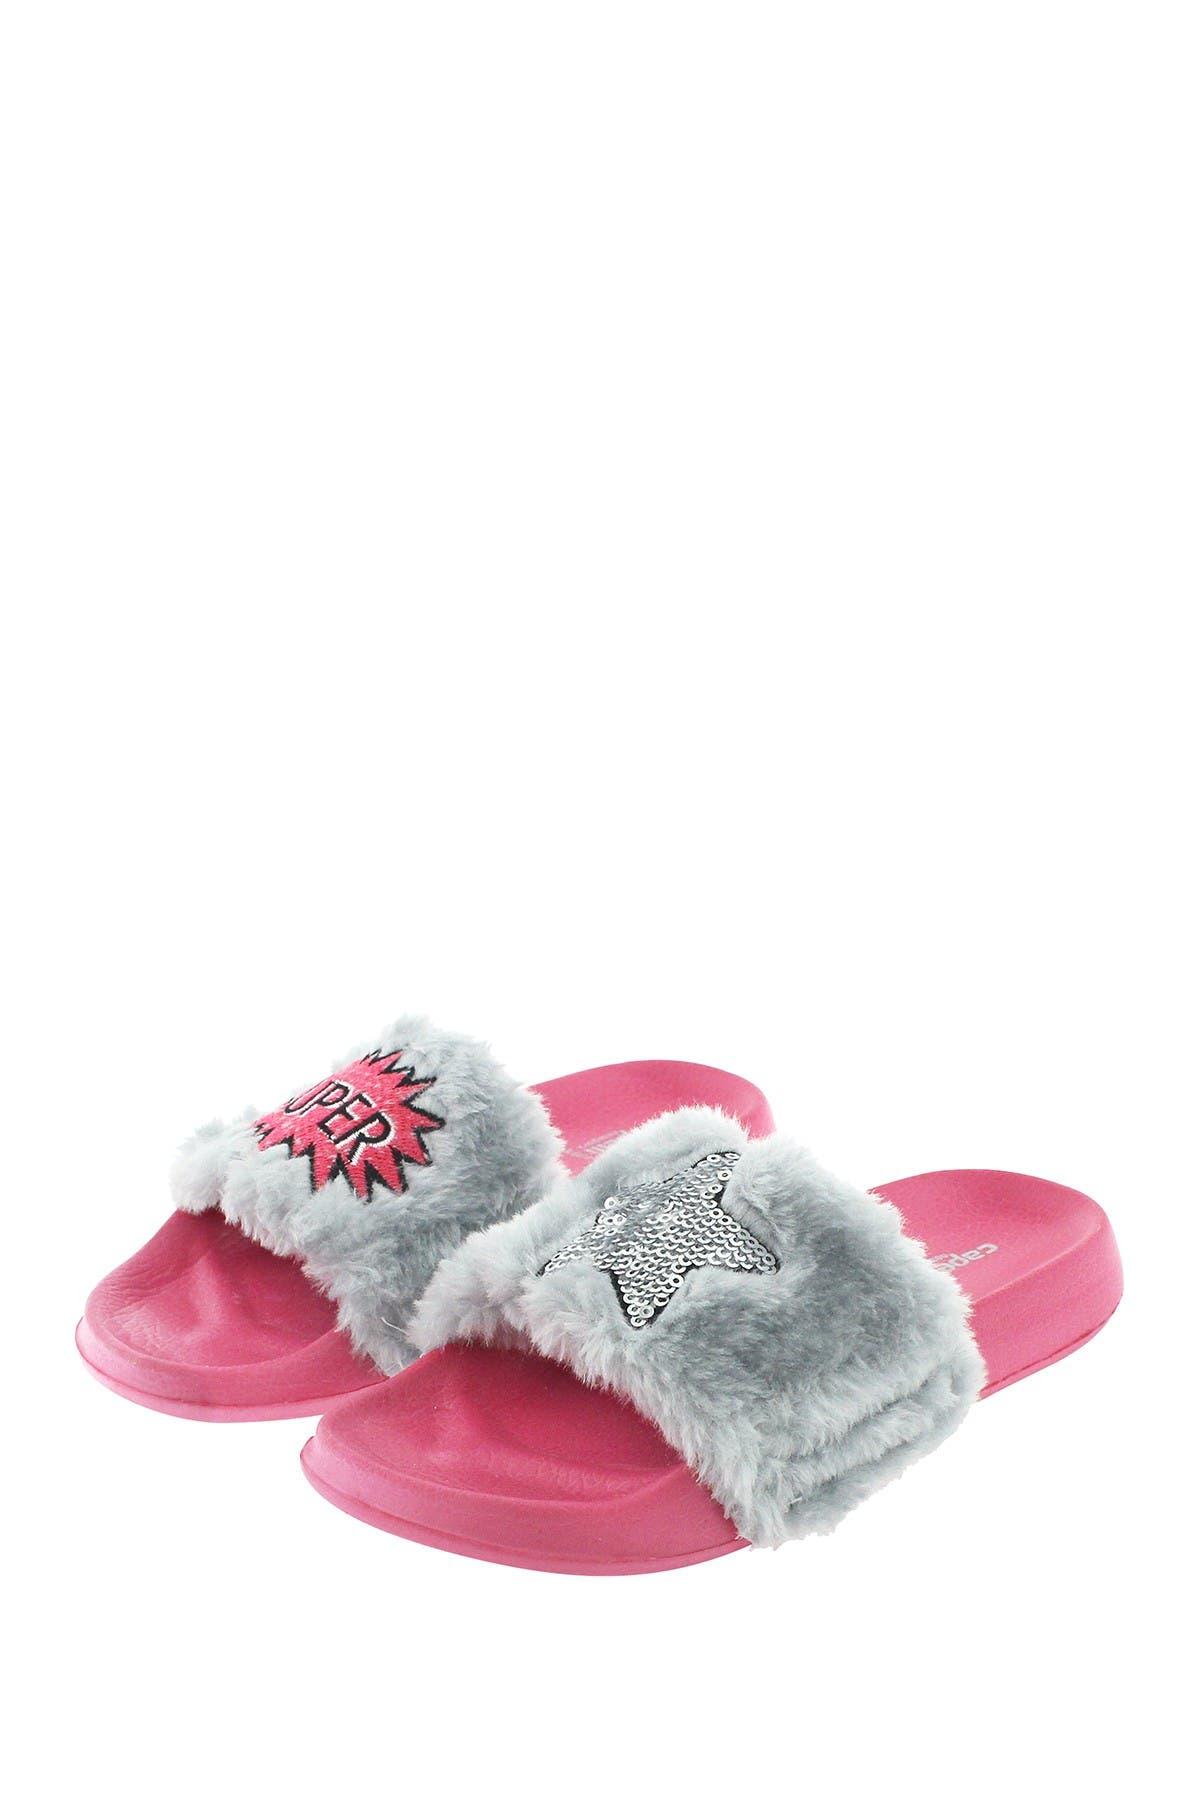 Image of CAPELLI OF NEW YORK Super Star Faux Fur Slide Sandal